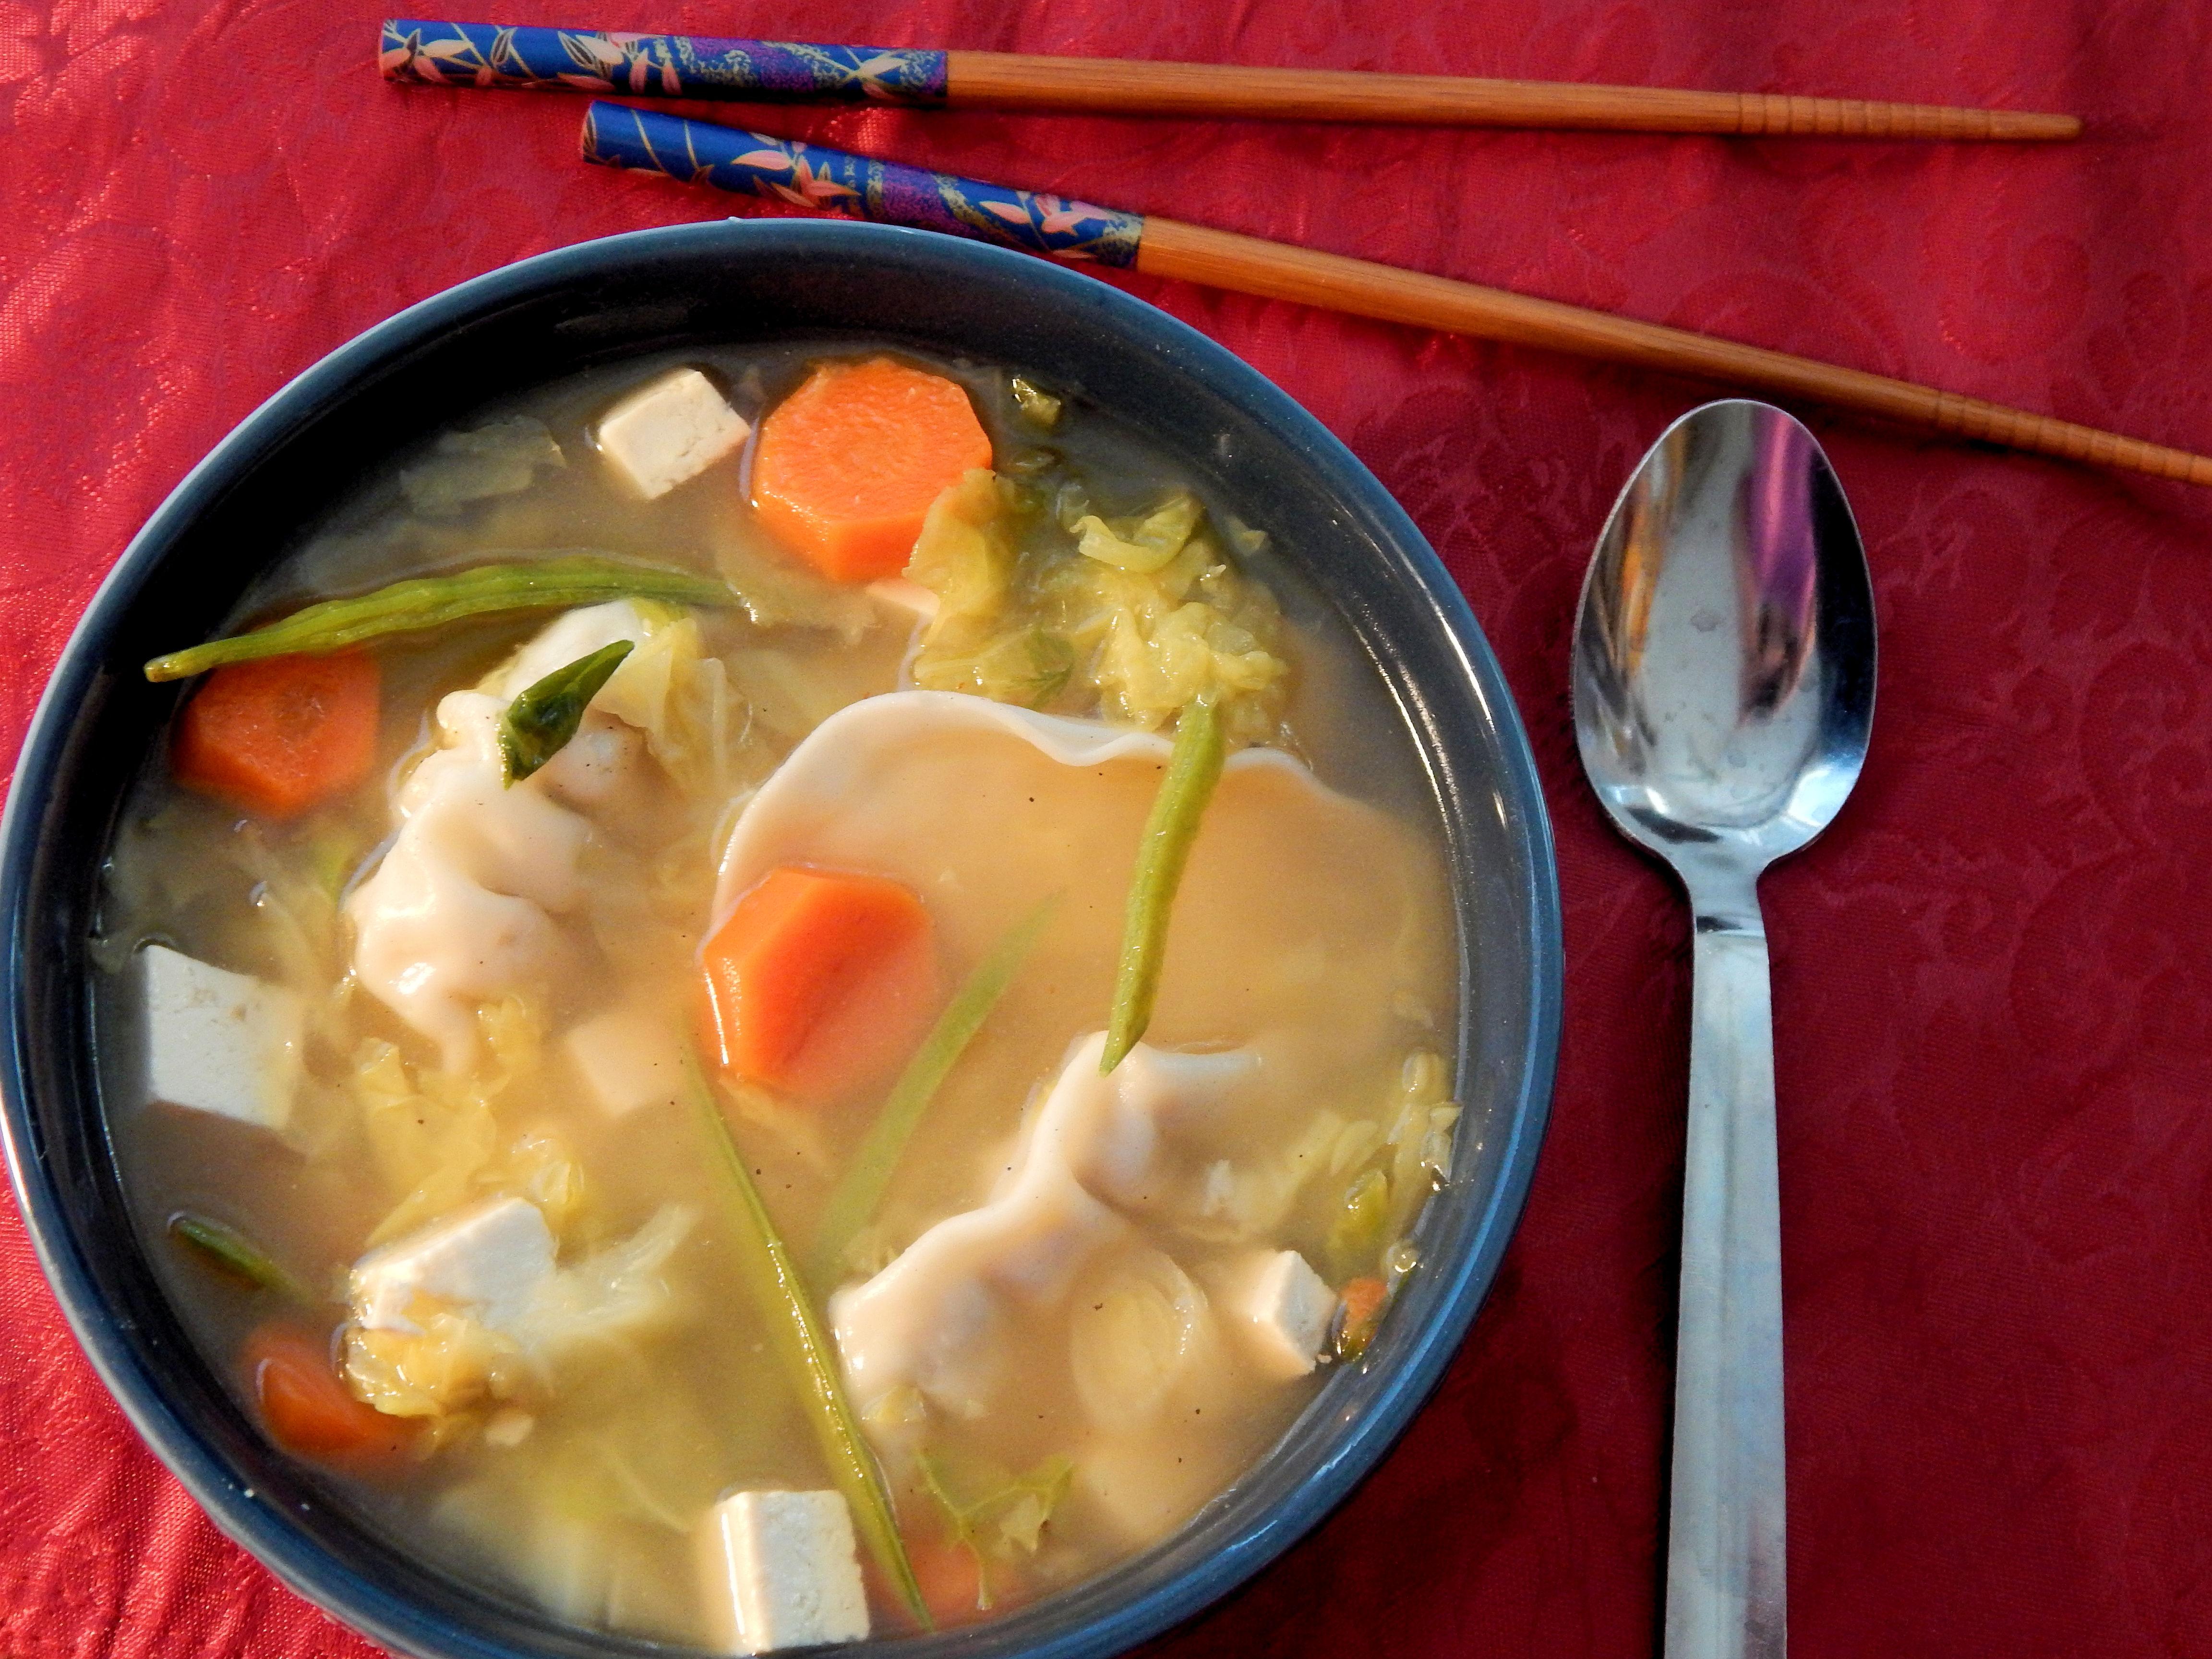 Veggie and Wonton Soup